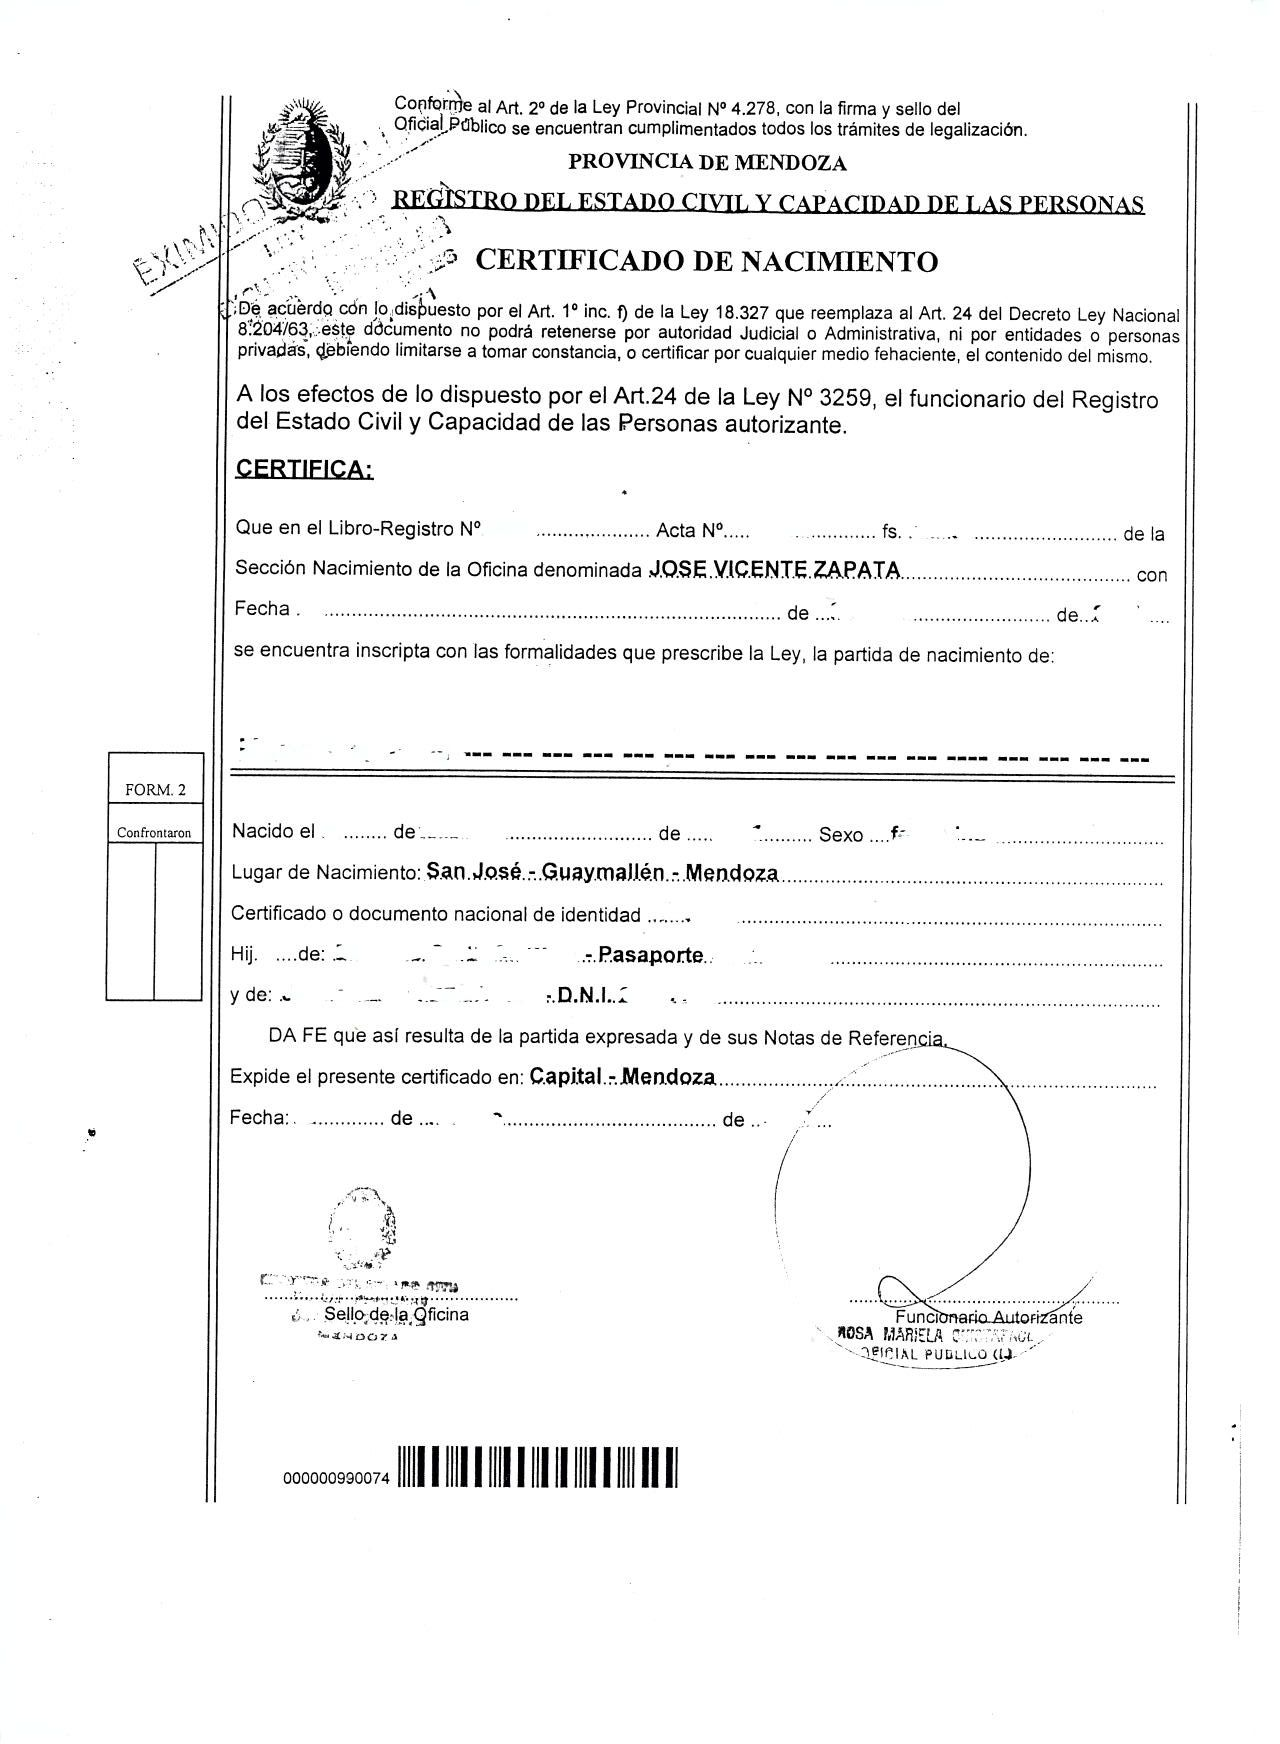 Best Birth Certificate Translation Template English To Spanish In 2021 Birth Certificate Template Certificate Template Birth Certificate